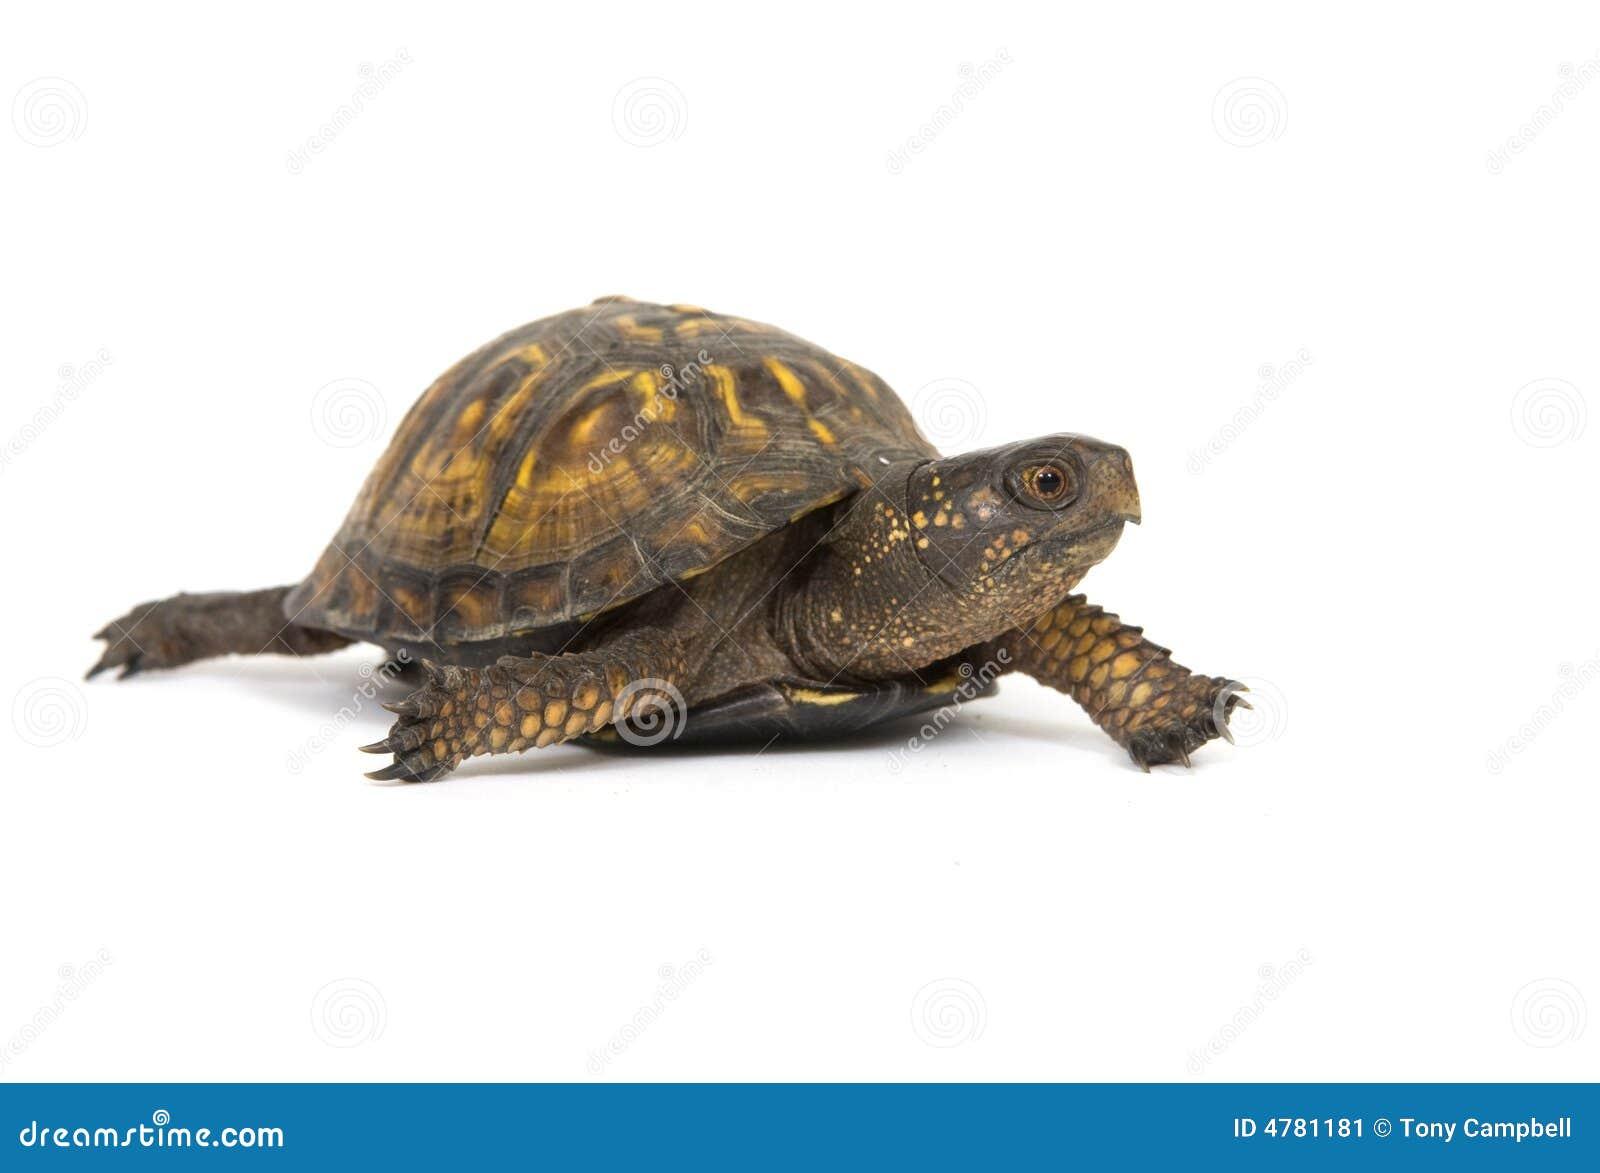 box turtle on a white background stock image image 4781181